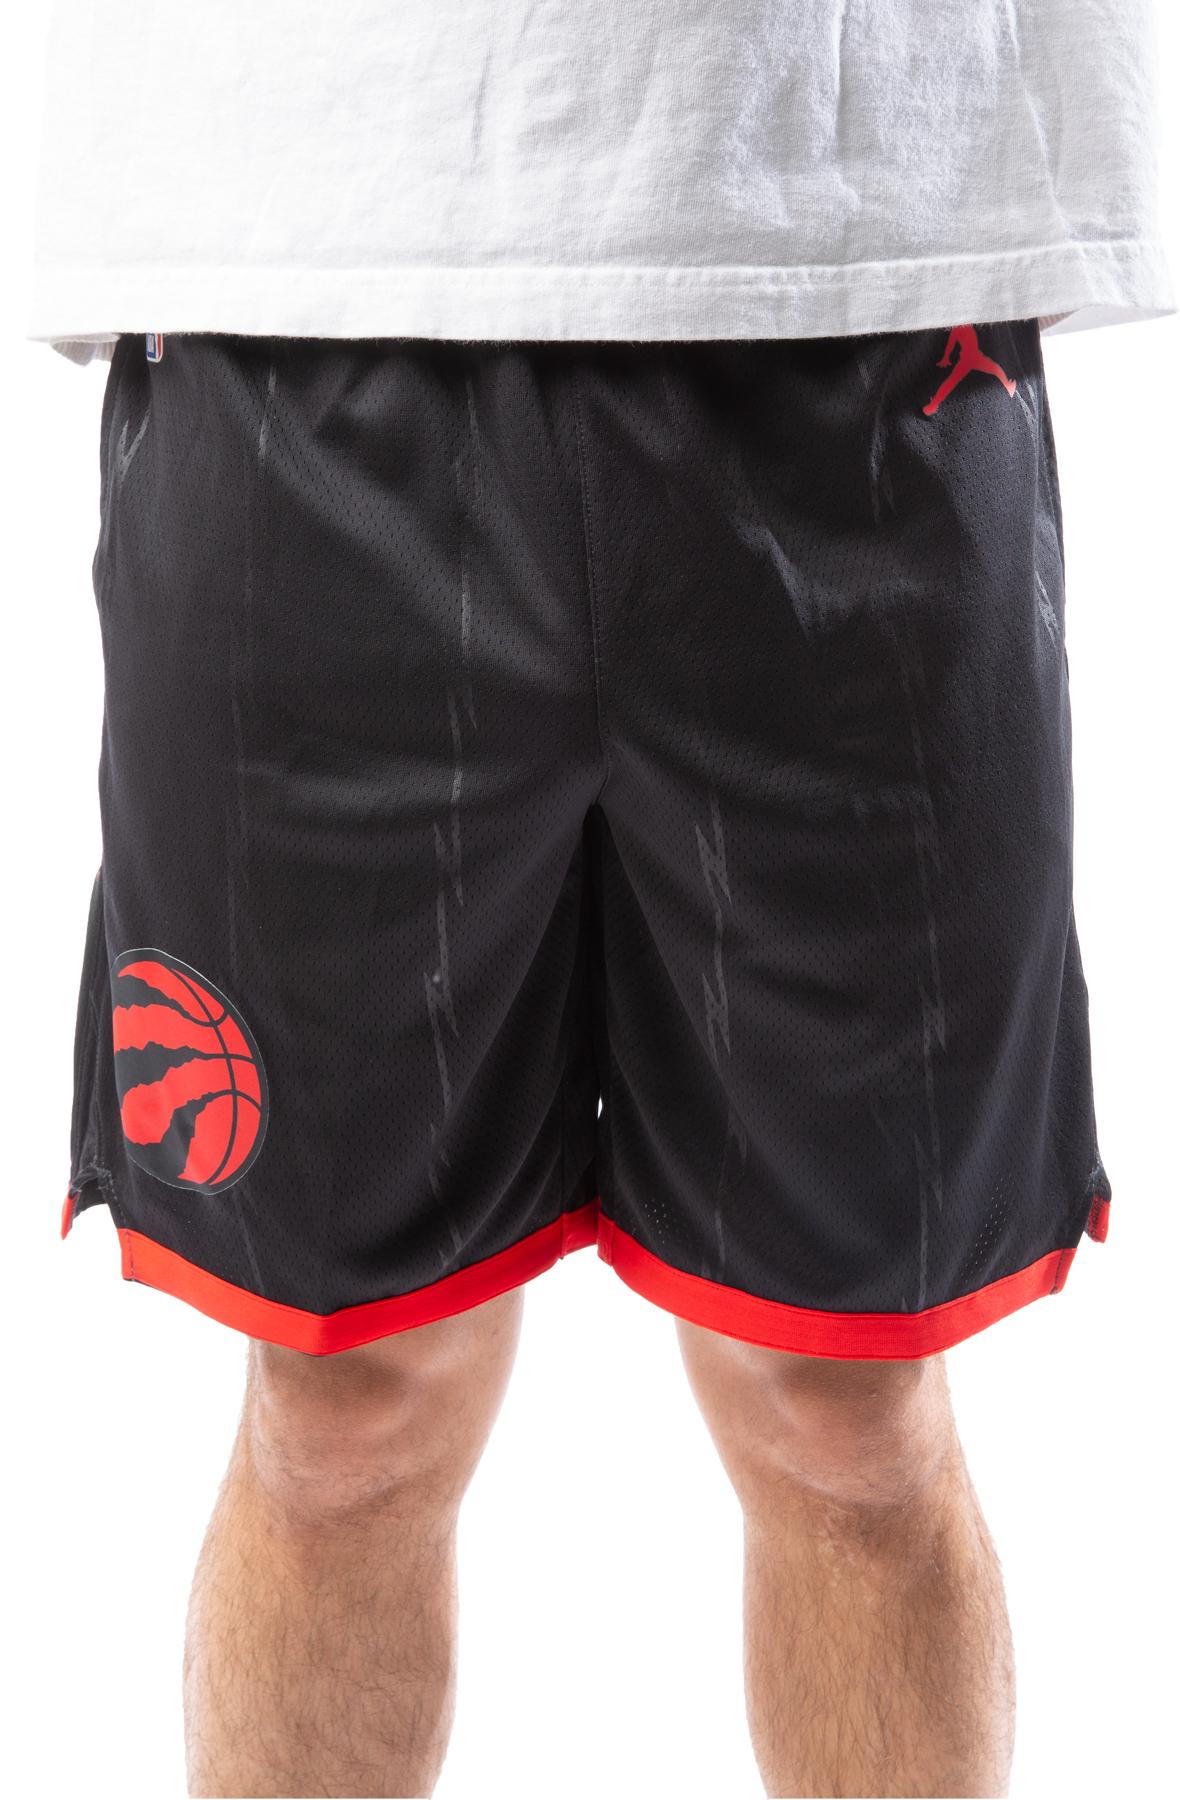 Raptors Statement Edition 2020 NBA Swingman Shorts Black/University Red